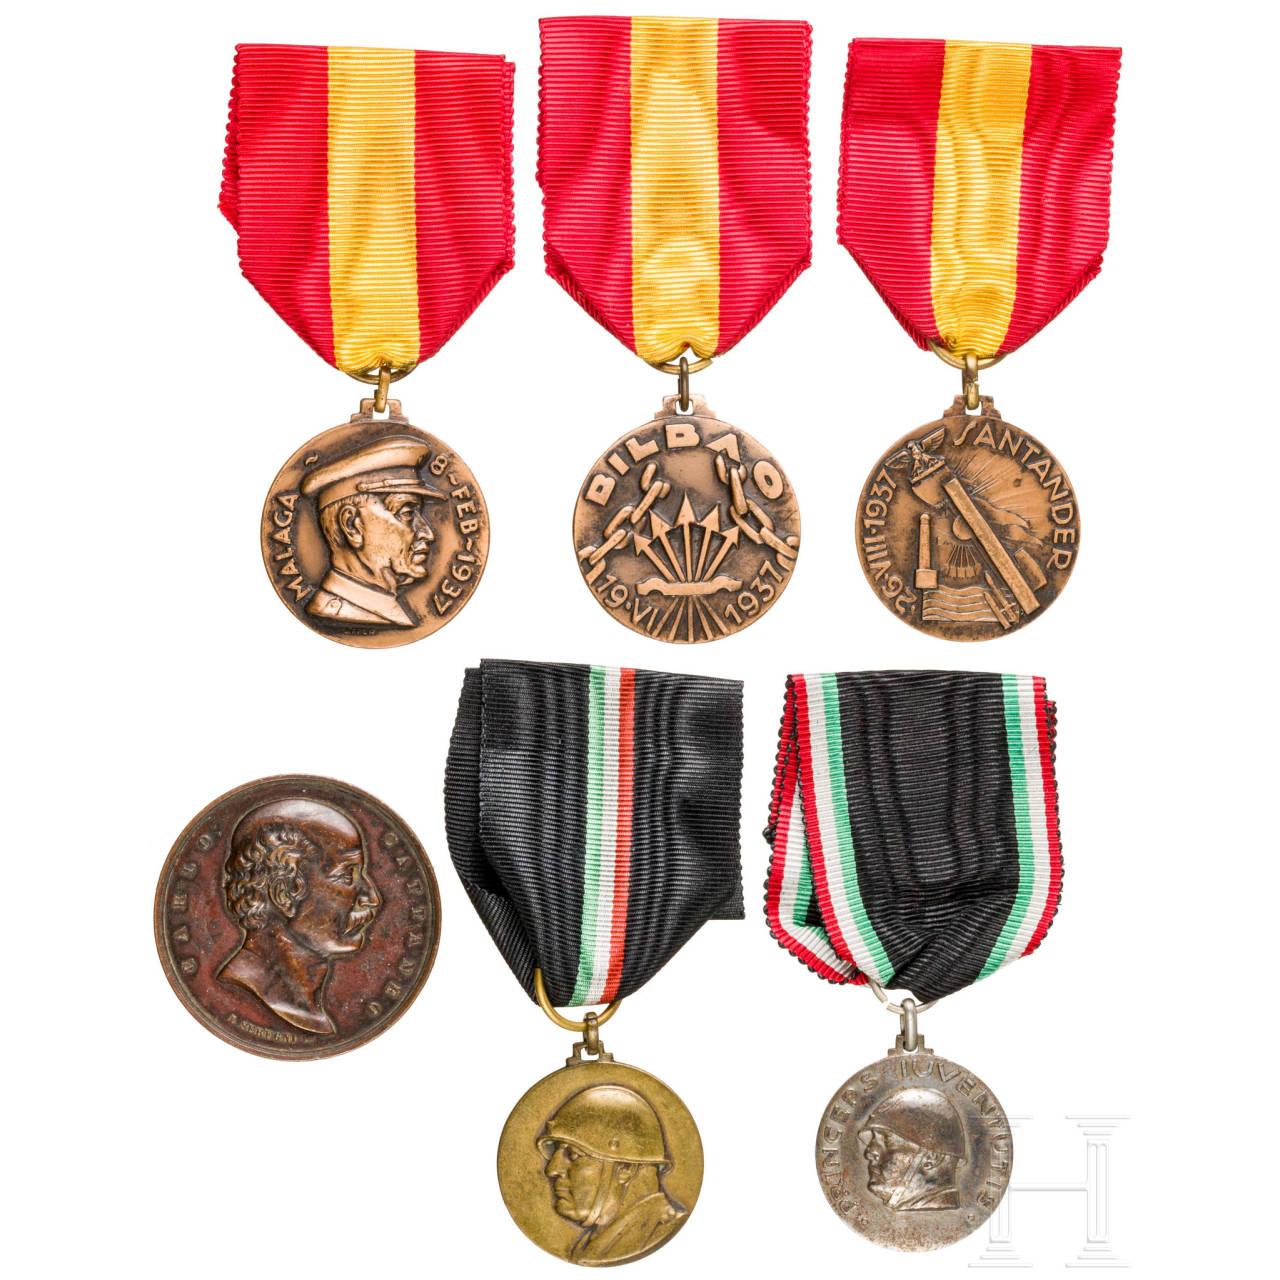 Six Spanish/Italian medals